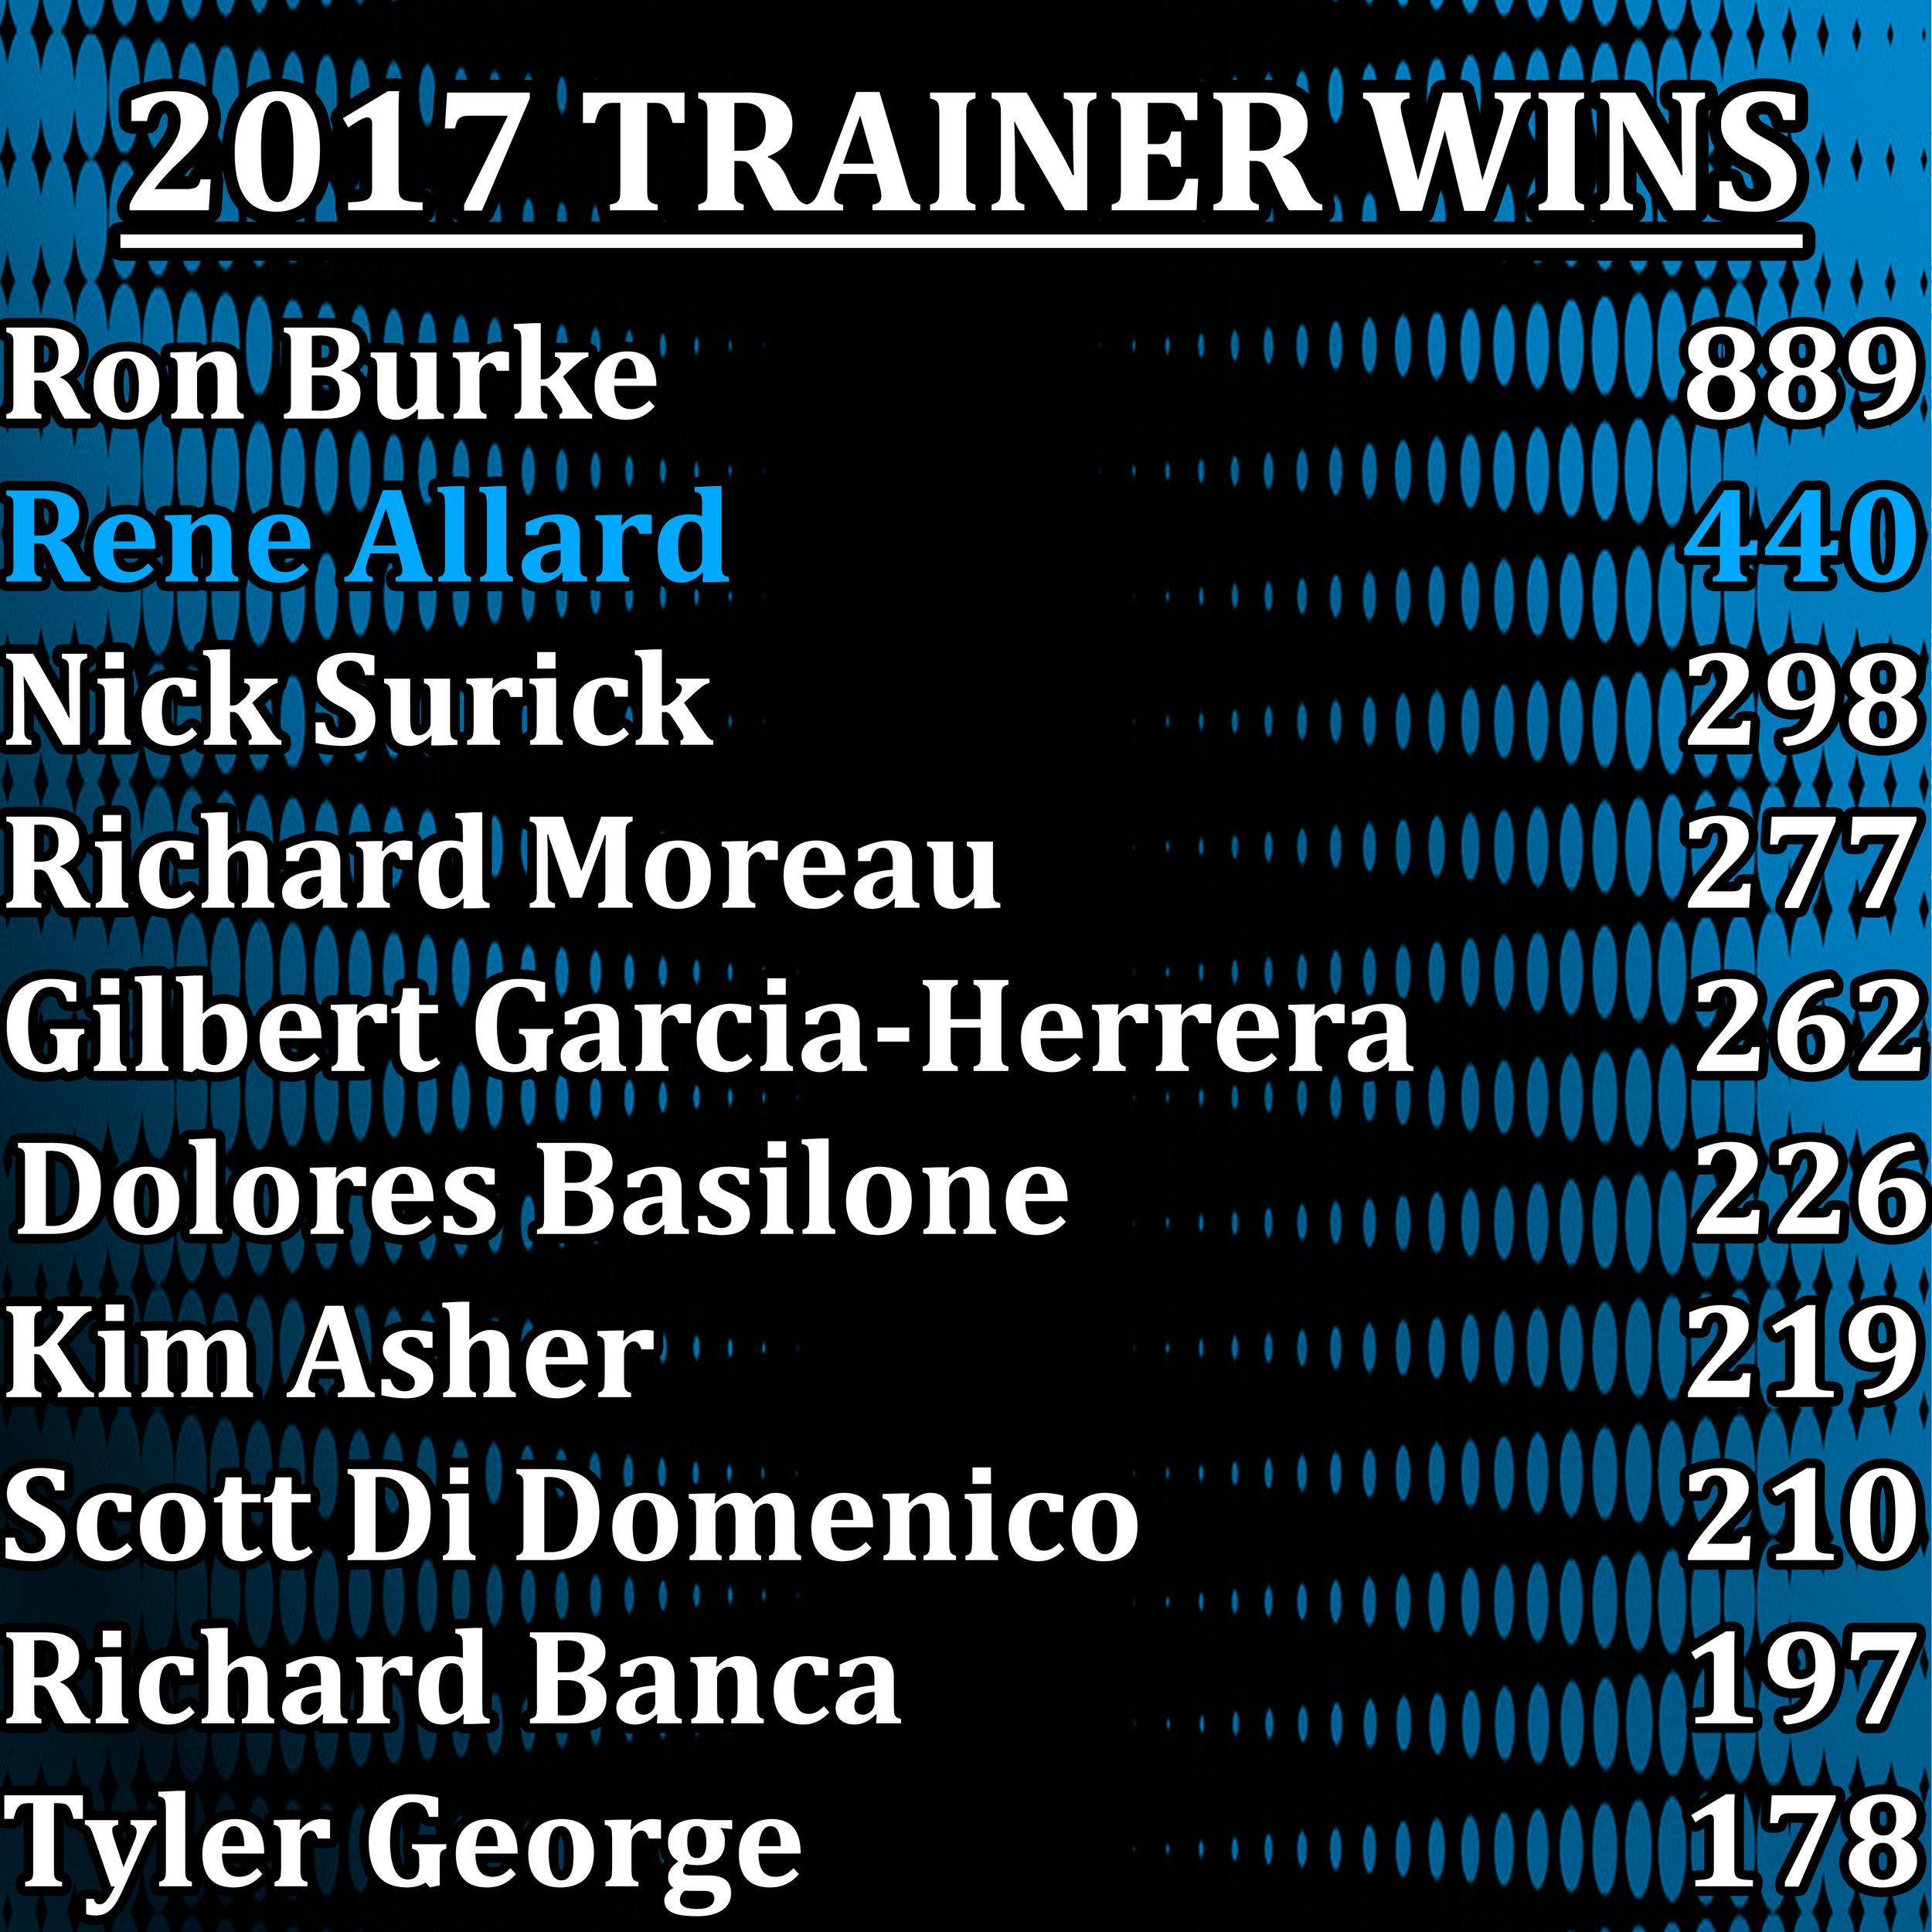 2017 Trainer Wins